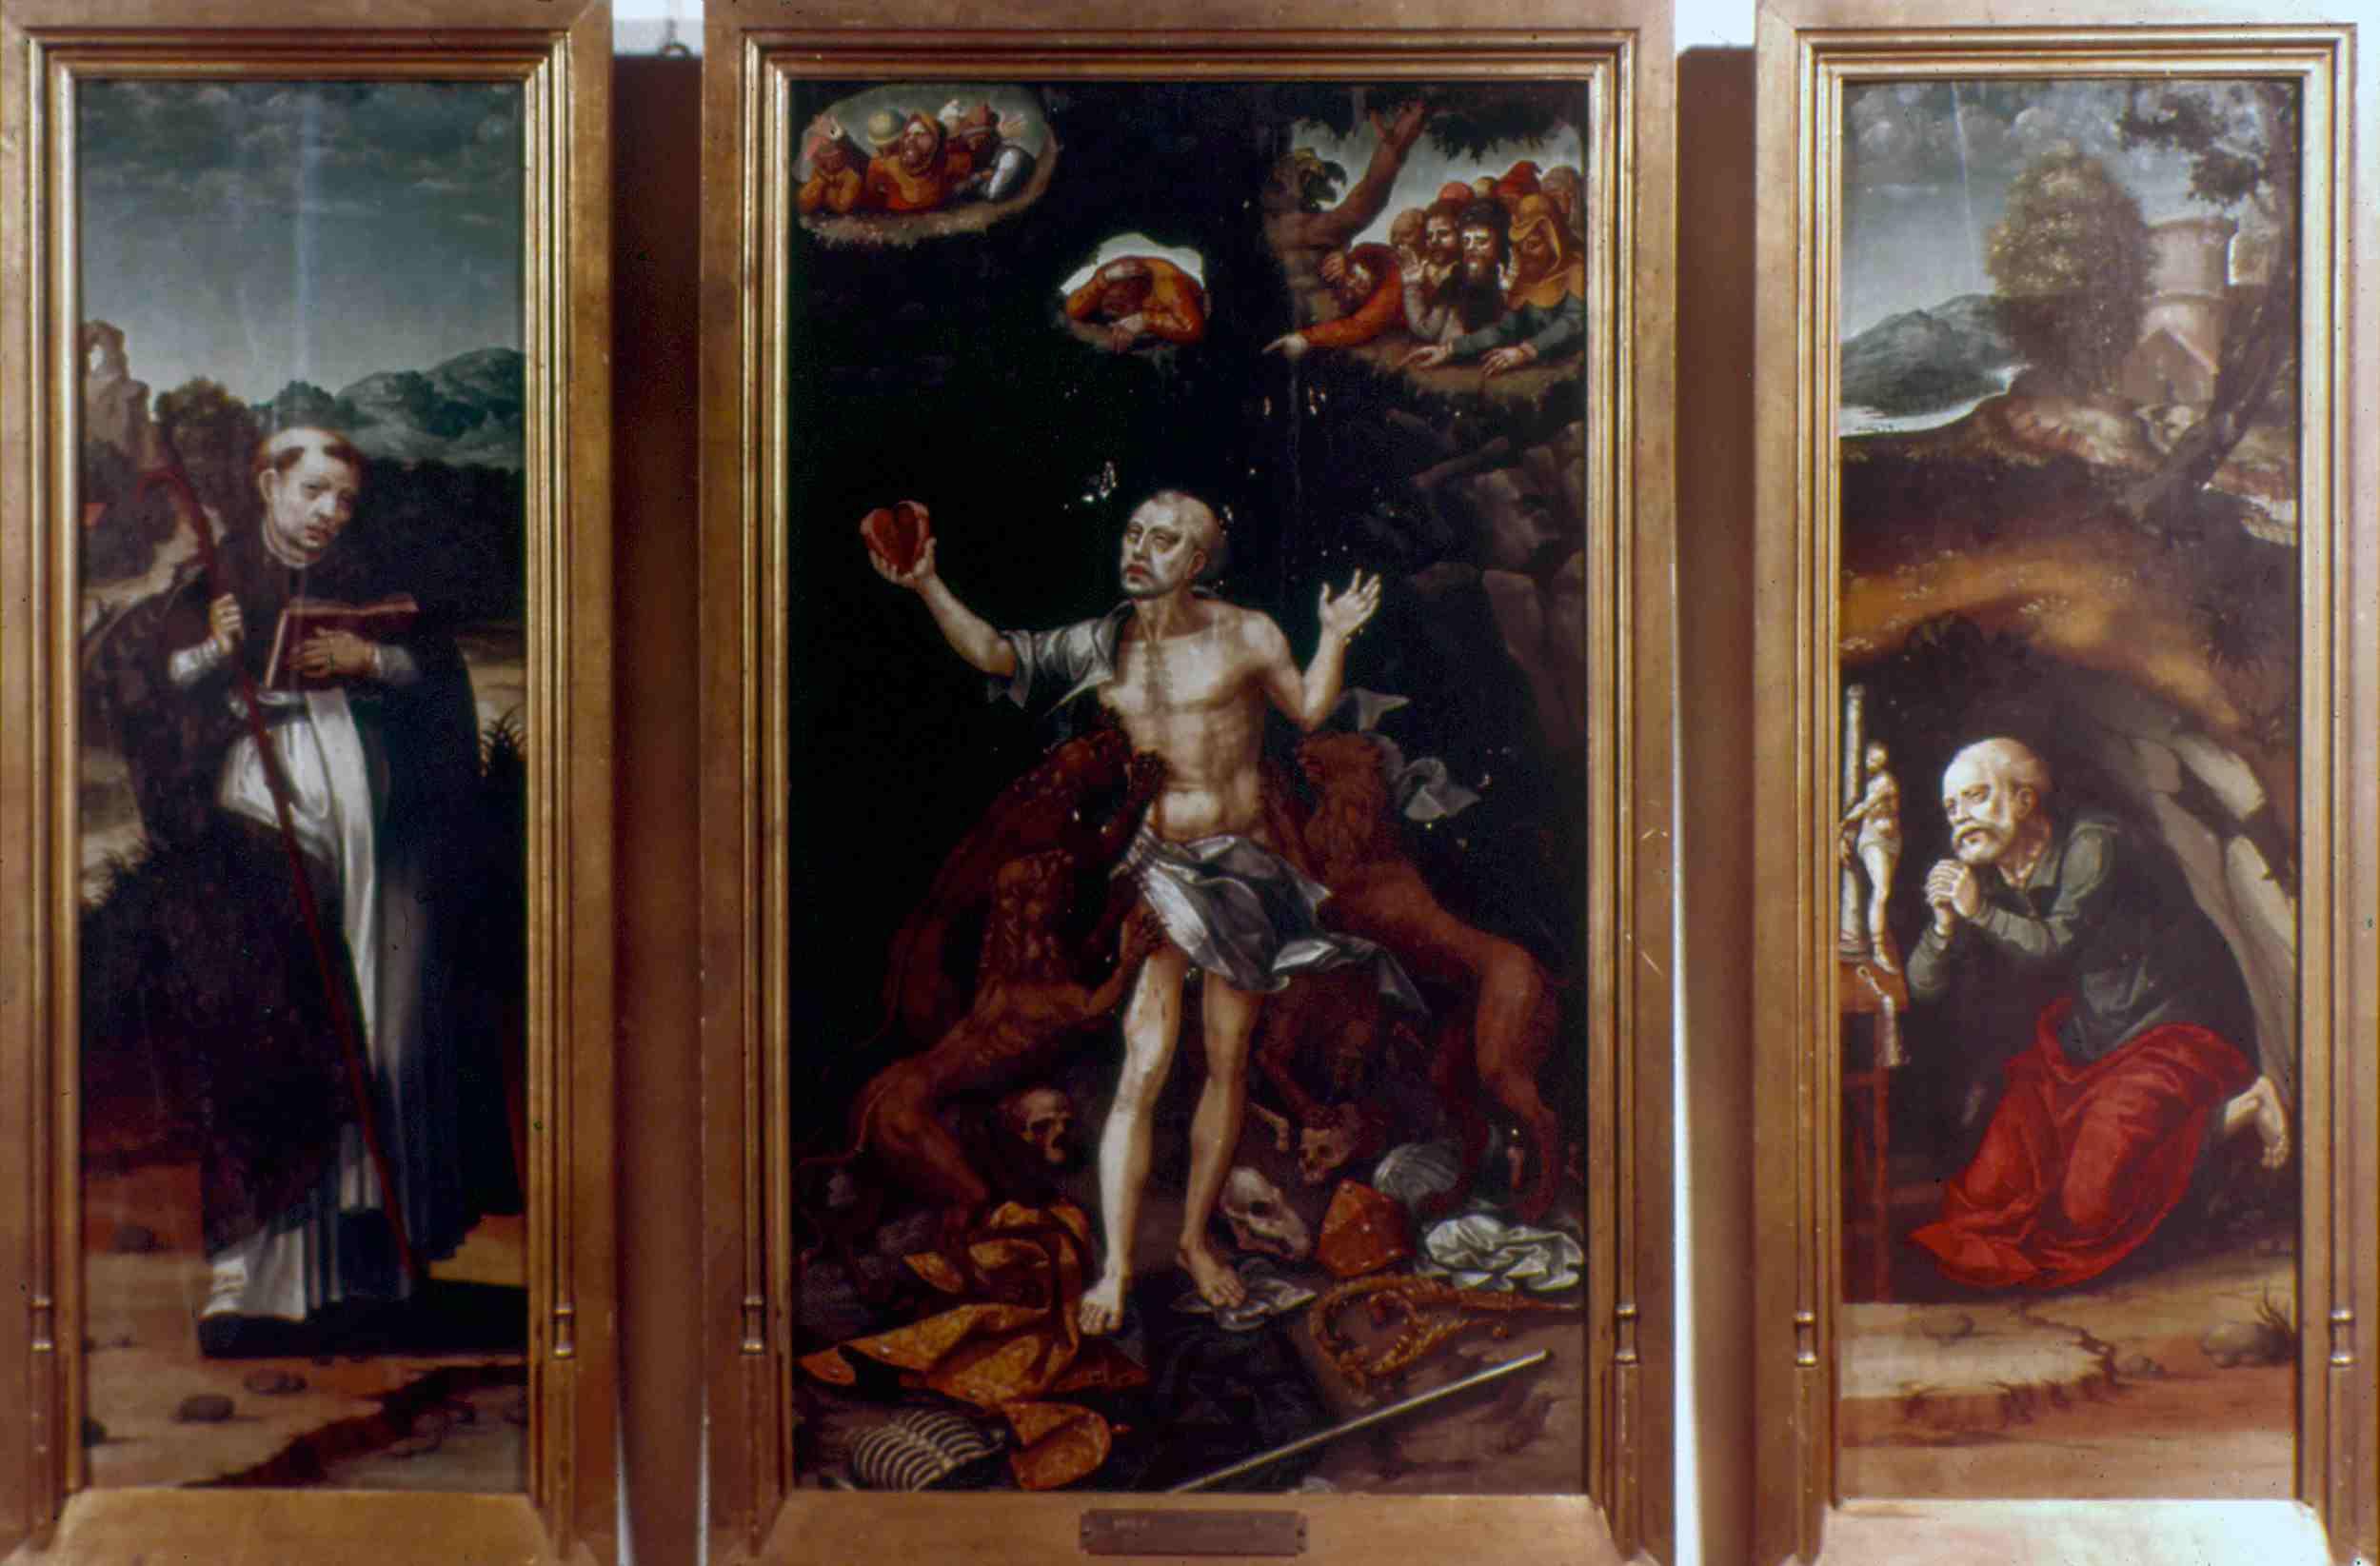 The Martyrdom of Saint Ignatius, Triptych